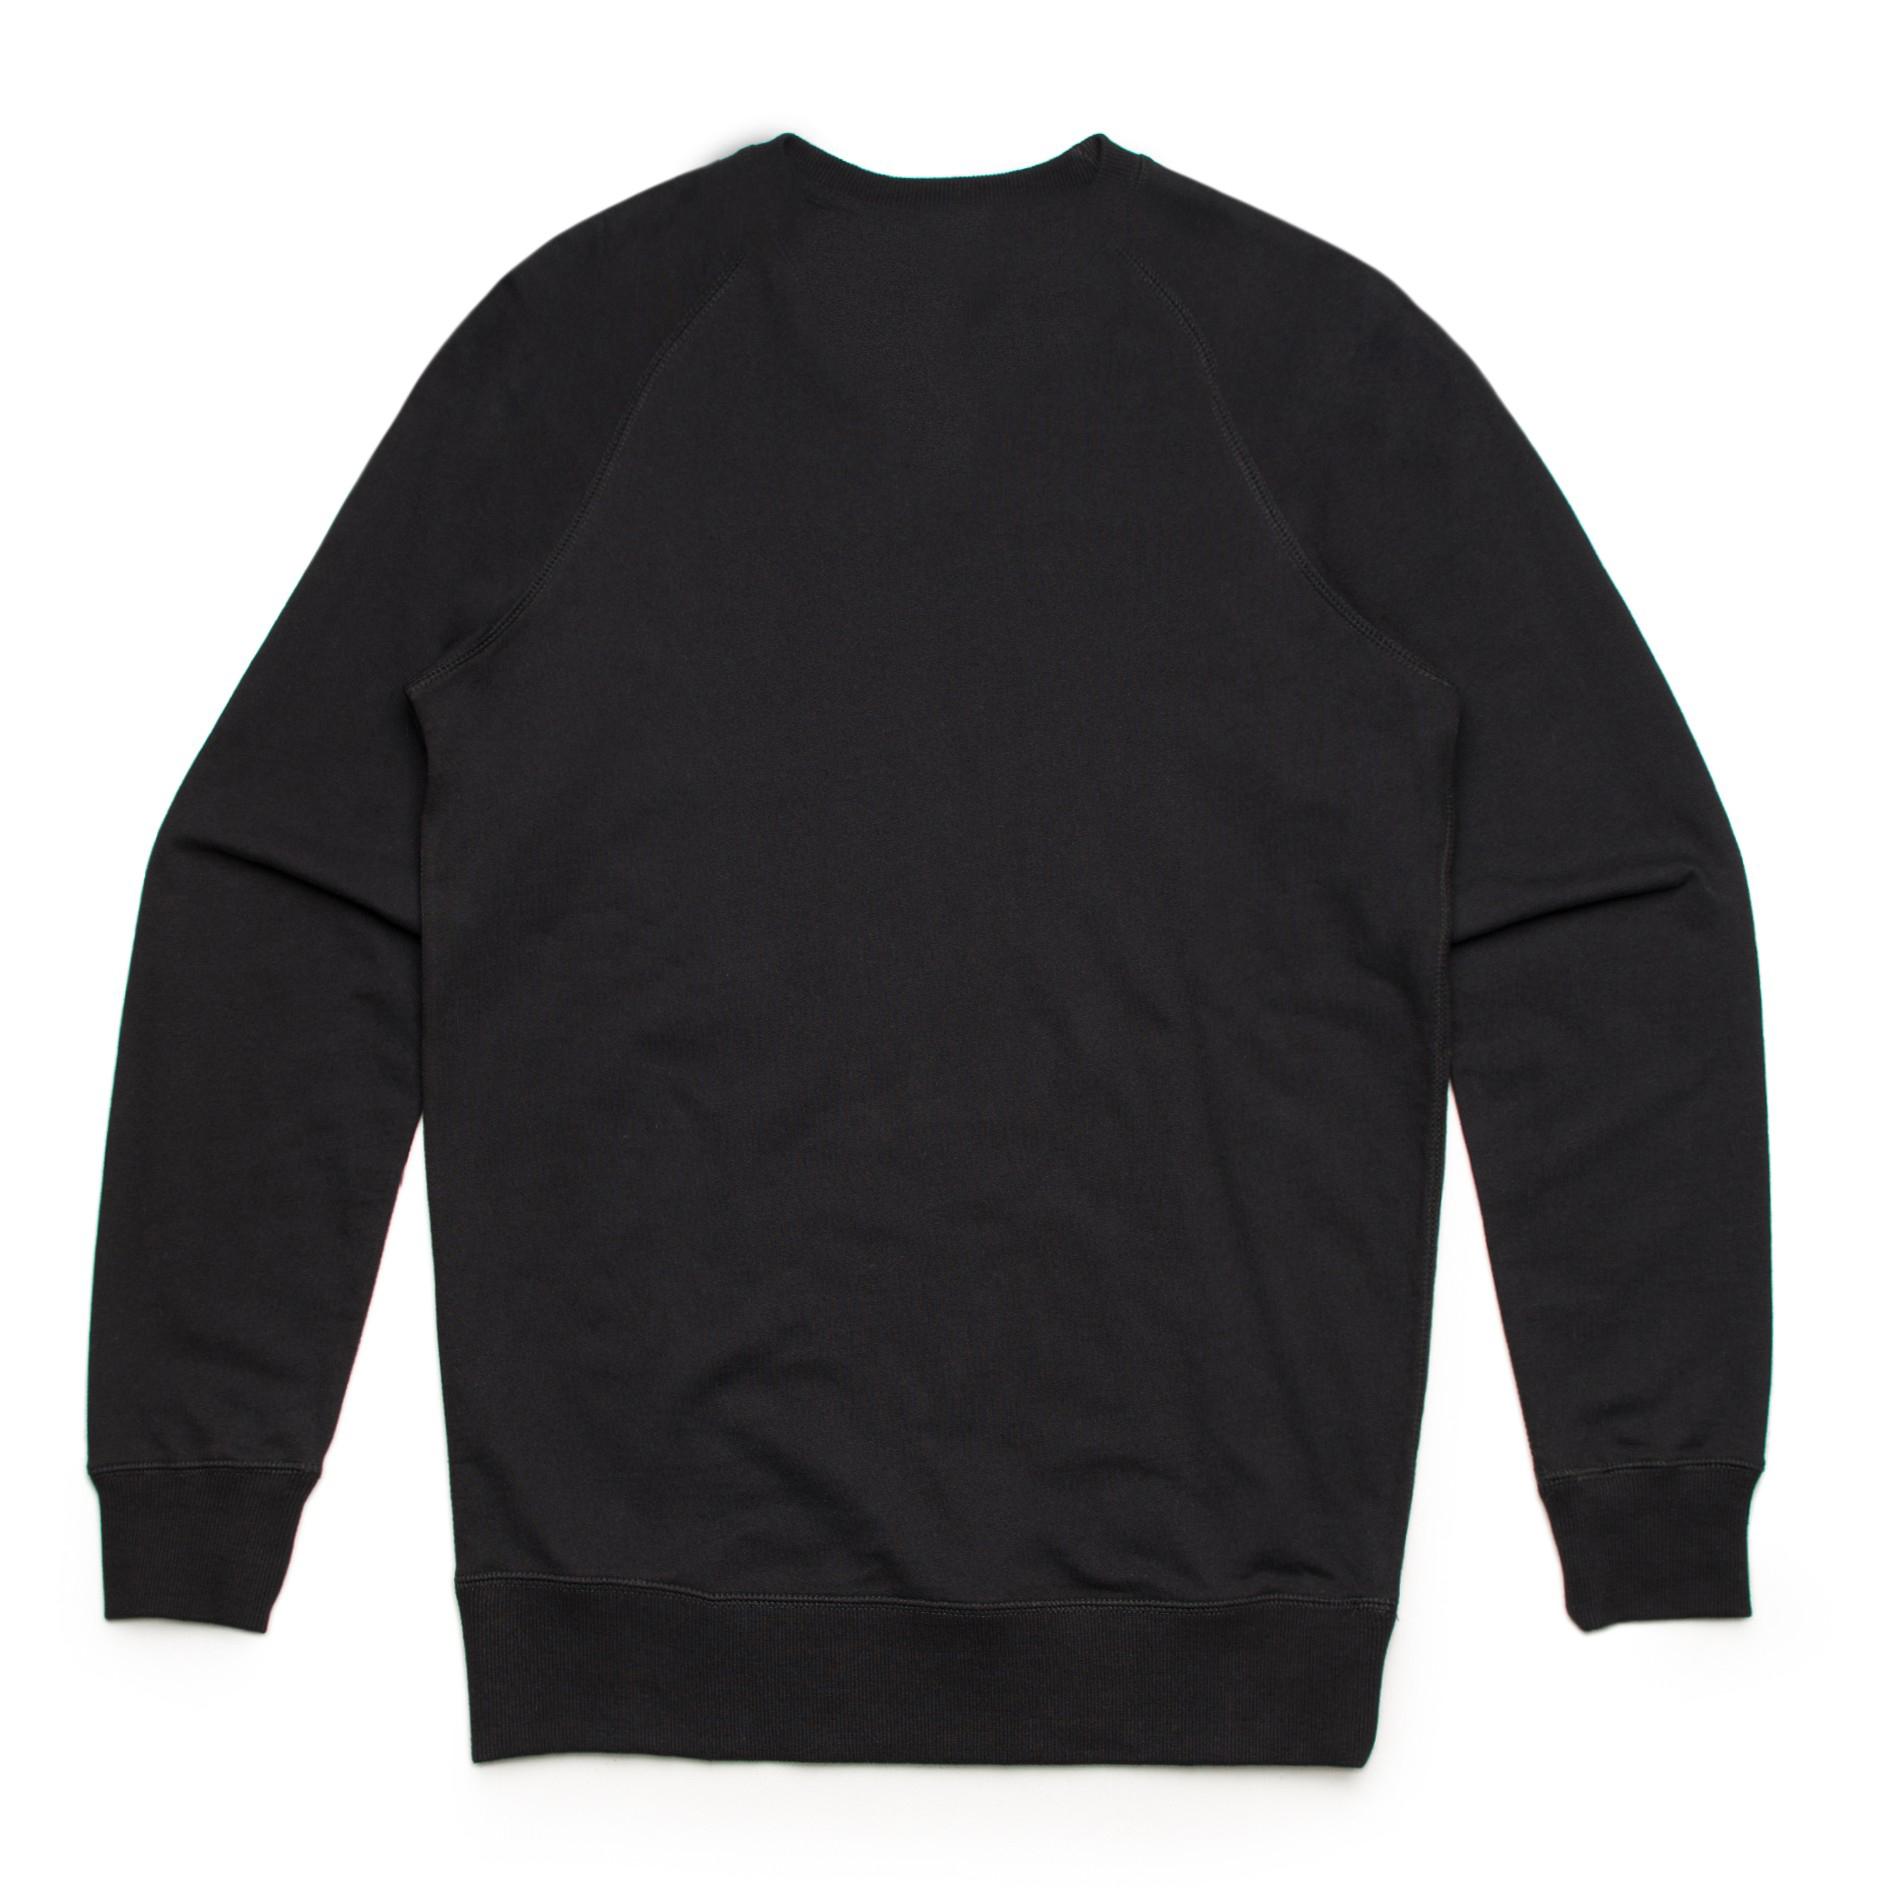 Design your t shirt nz - Unisex Brush Crew T Shirt Printing Nz Design Your Own Custom Shirt New Zealand